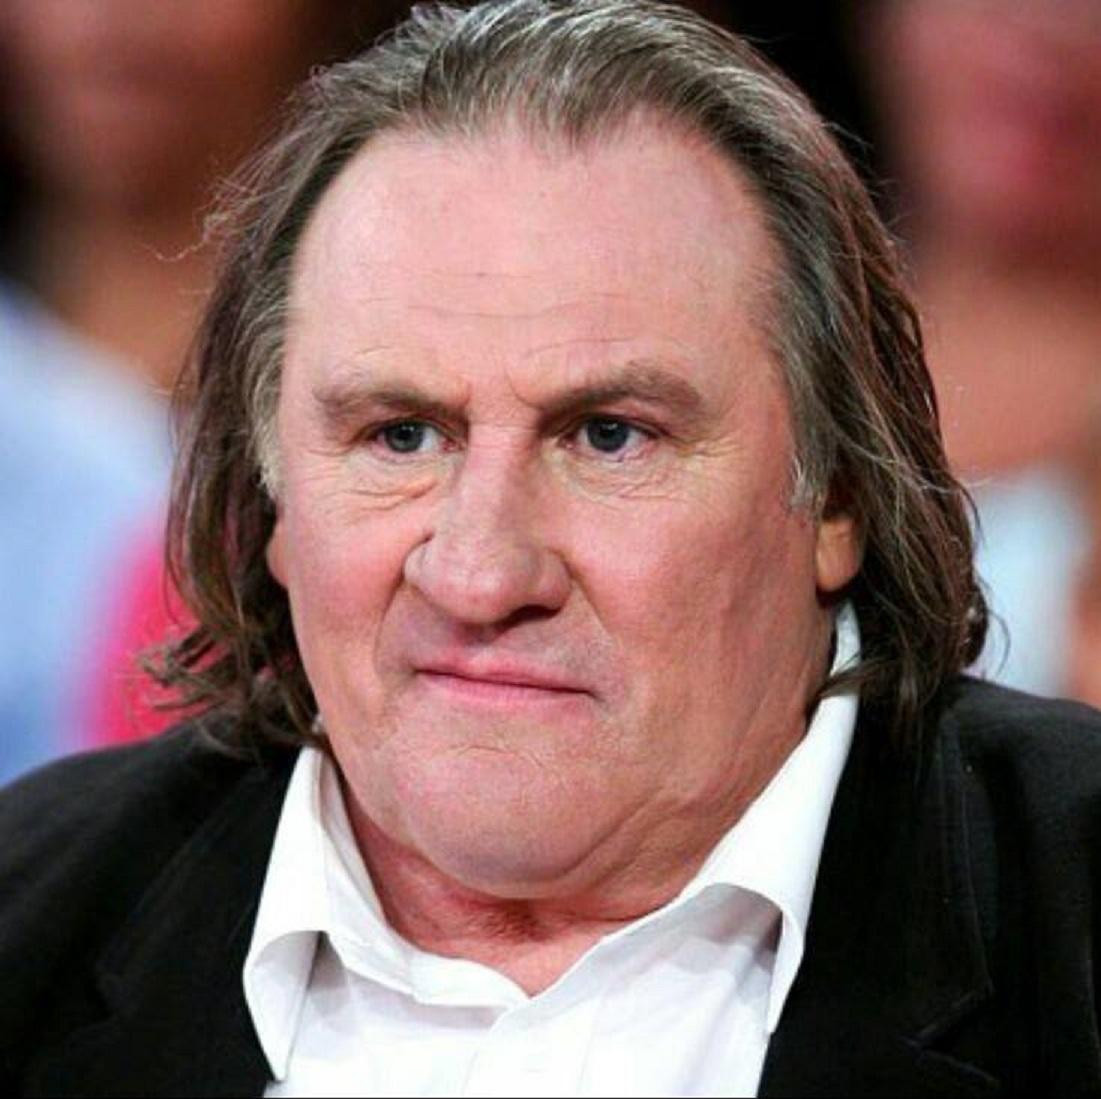 Gerard Depardieu accusato di stupro